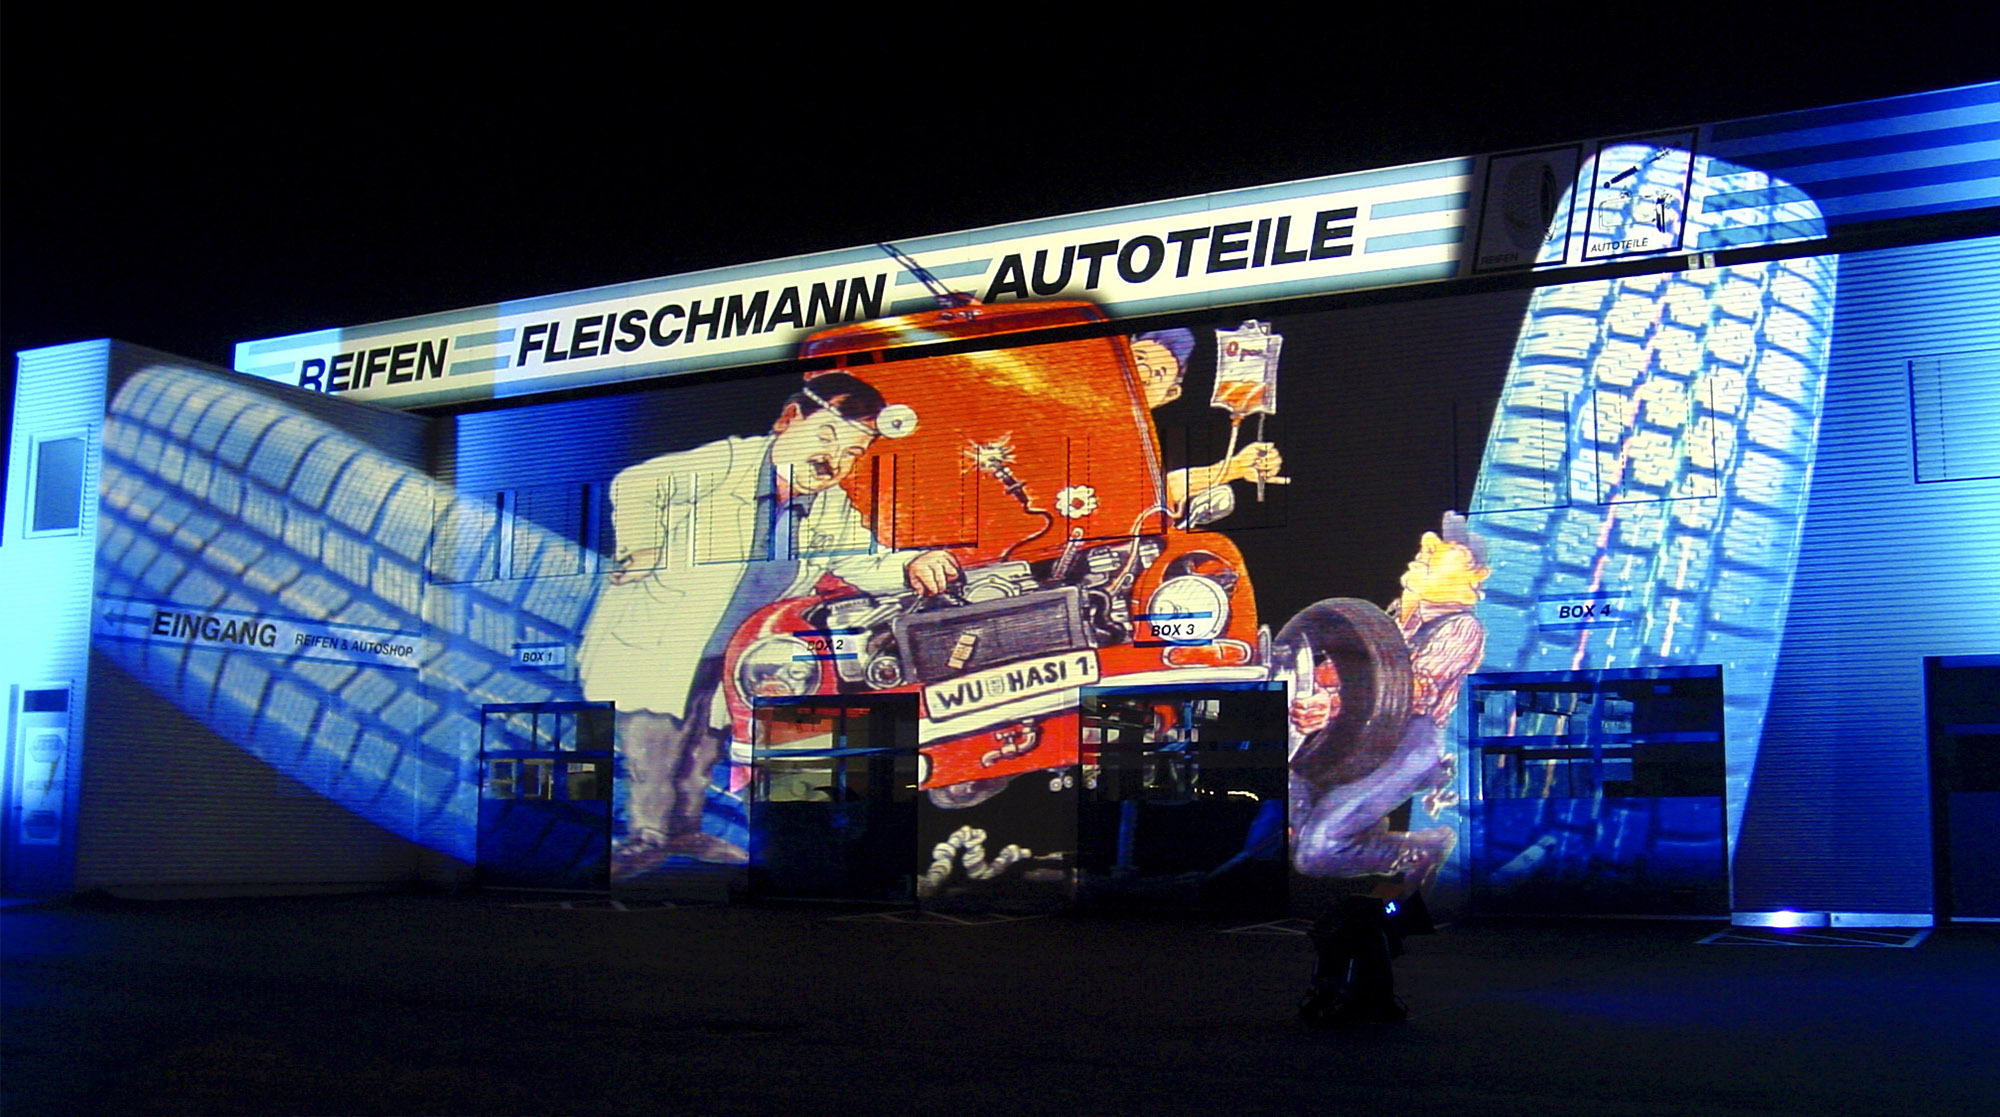 Fleischmann_01.jpg